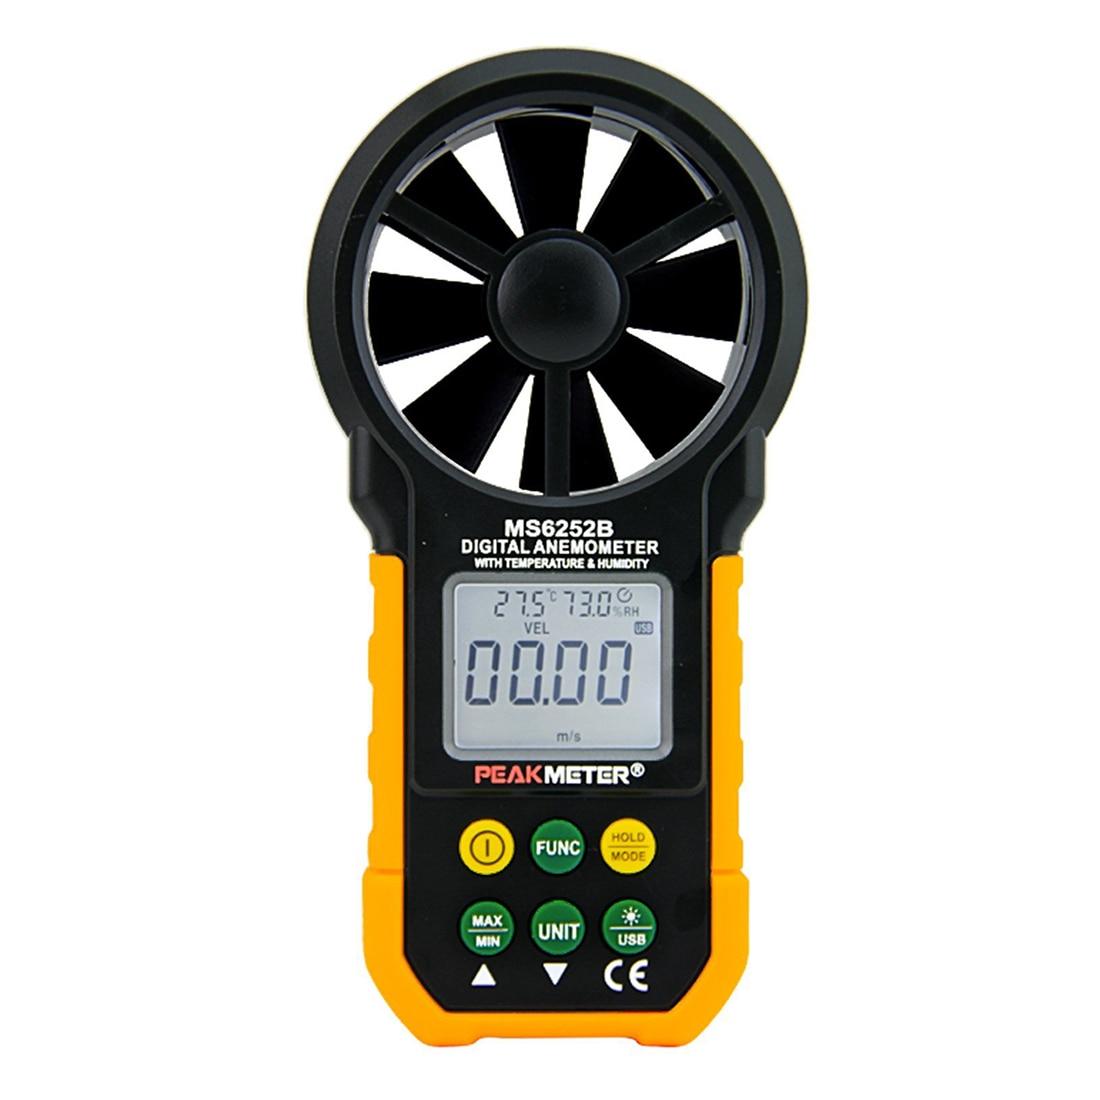 PEAKMETER MS6252B USB Digital Anemometer Air Flow Tester Meter peakmeter ms6252b digital anemometer air speed velocity air flow meter with air temperature humidity rh usb port